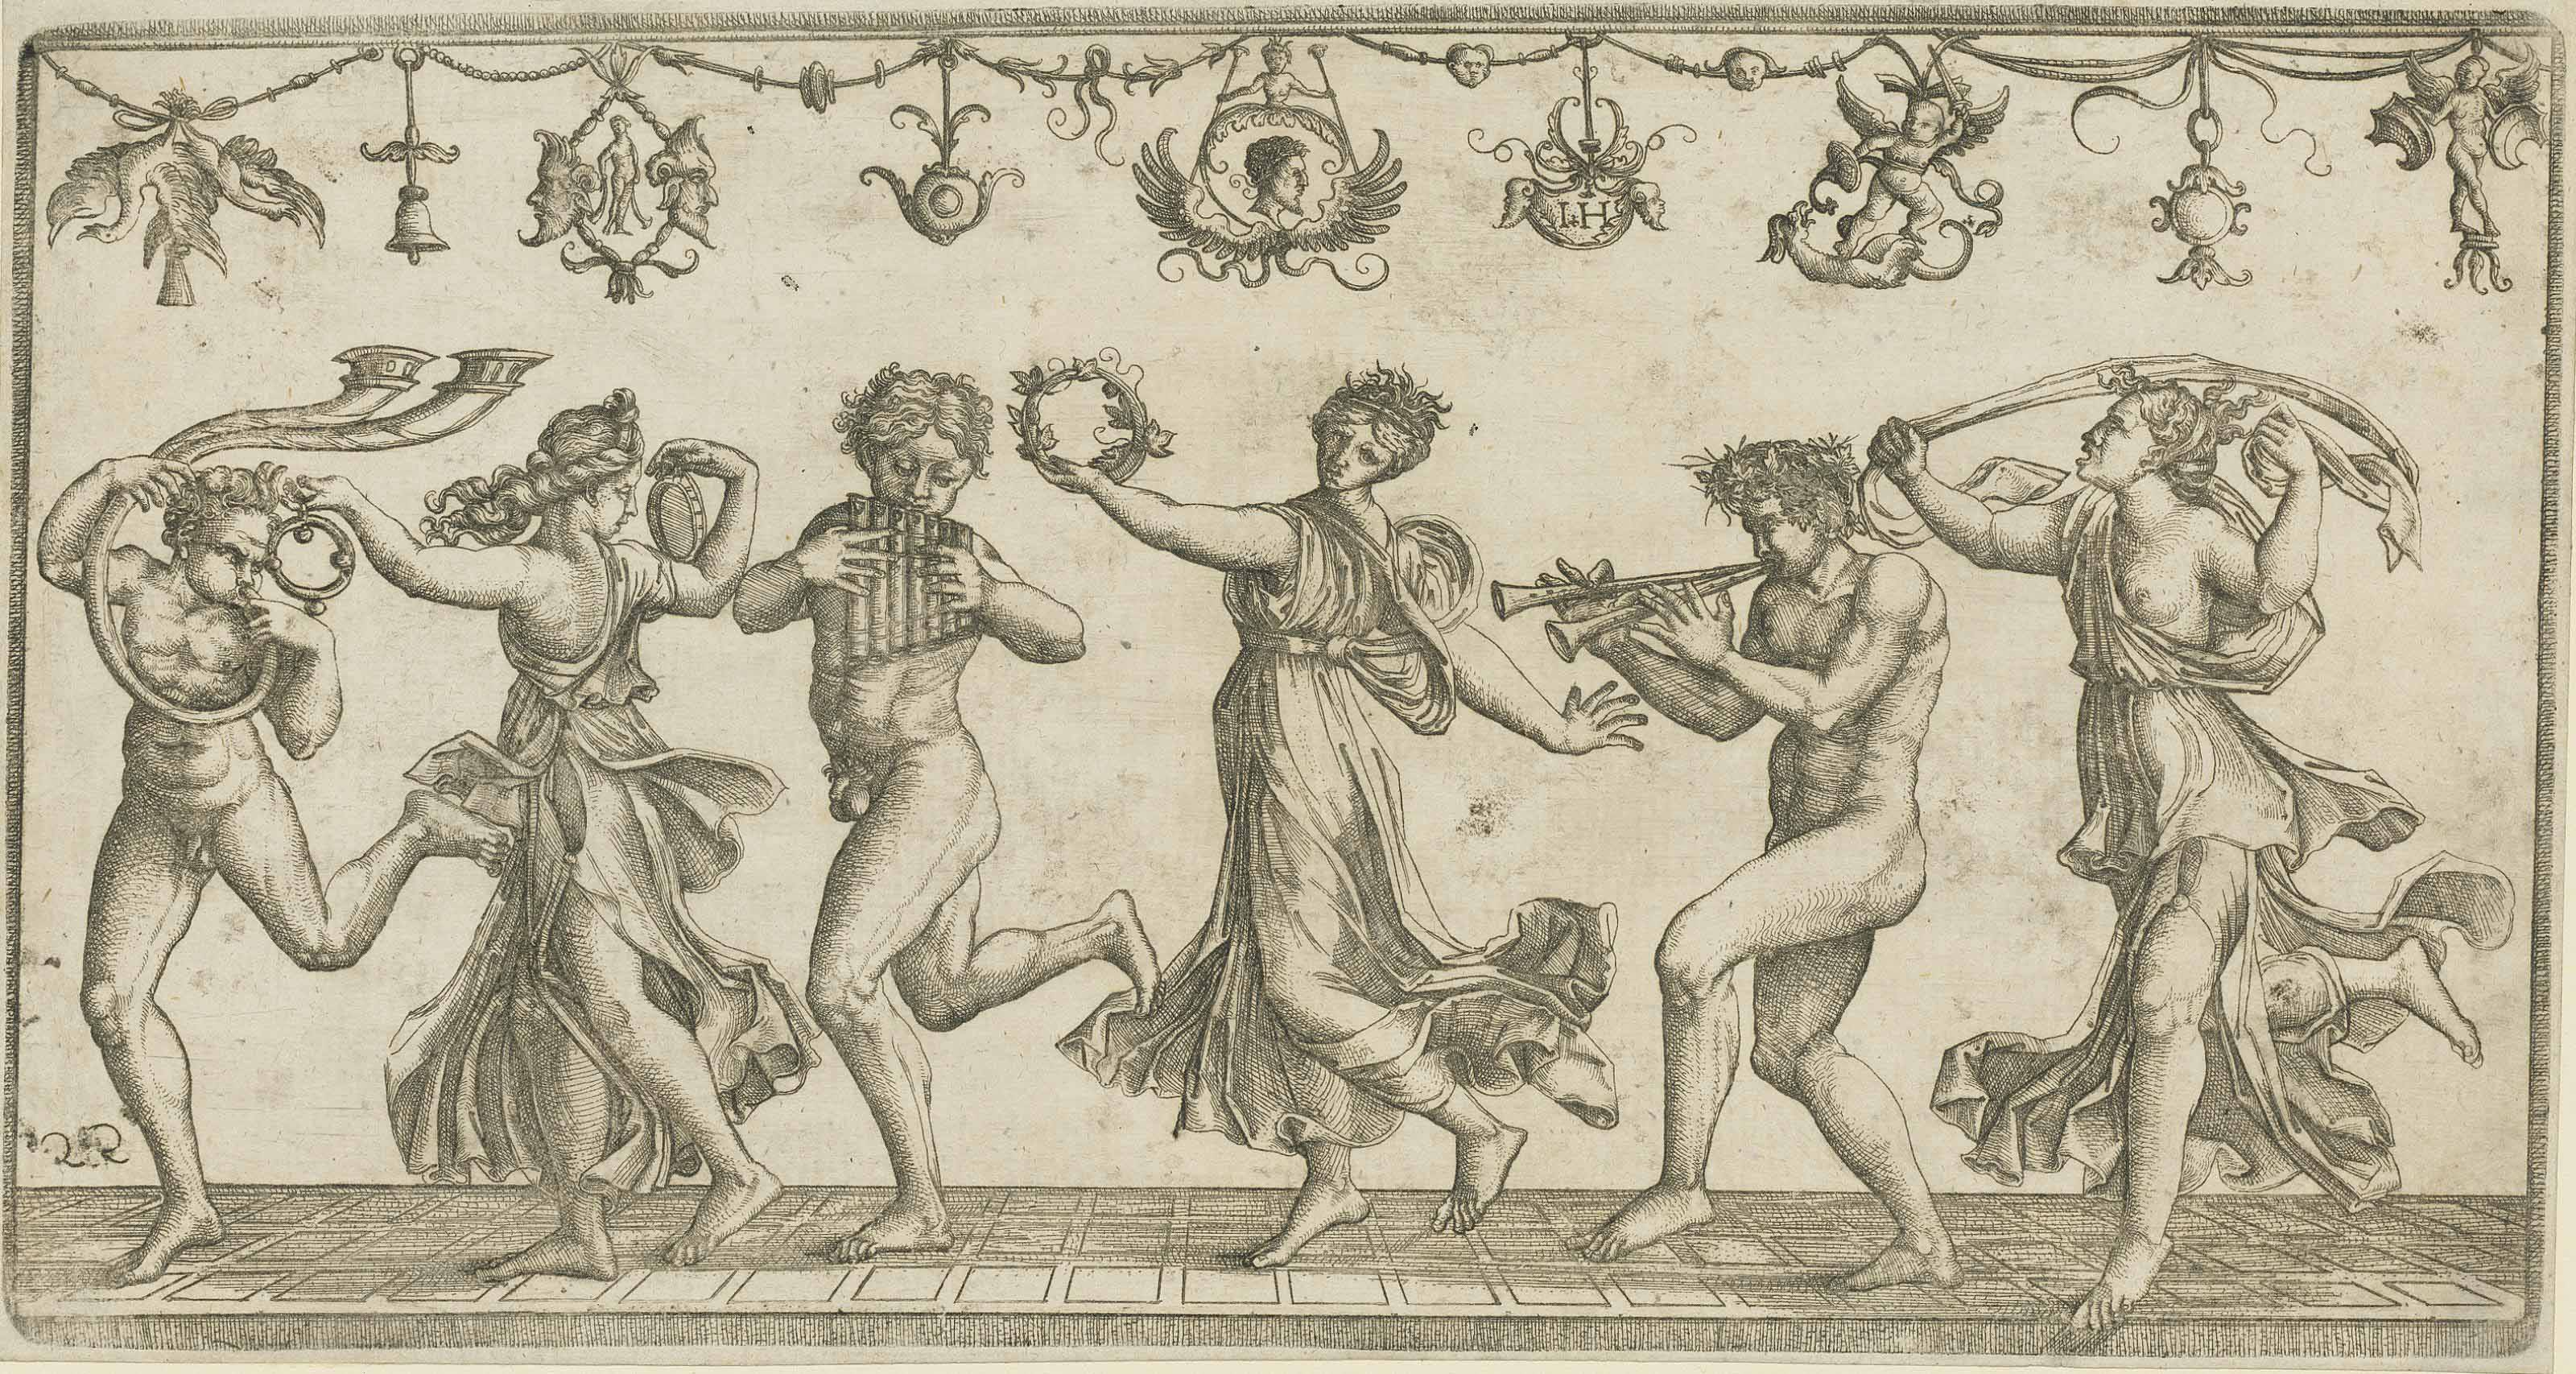 Hieronymus Hopfer (circa 1500-1563) after Agostino Veneziano (1490-1540)